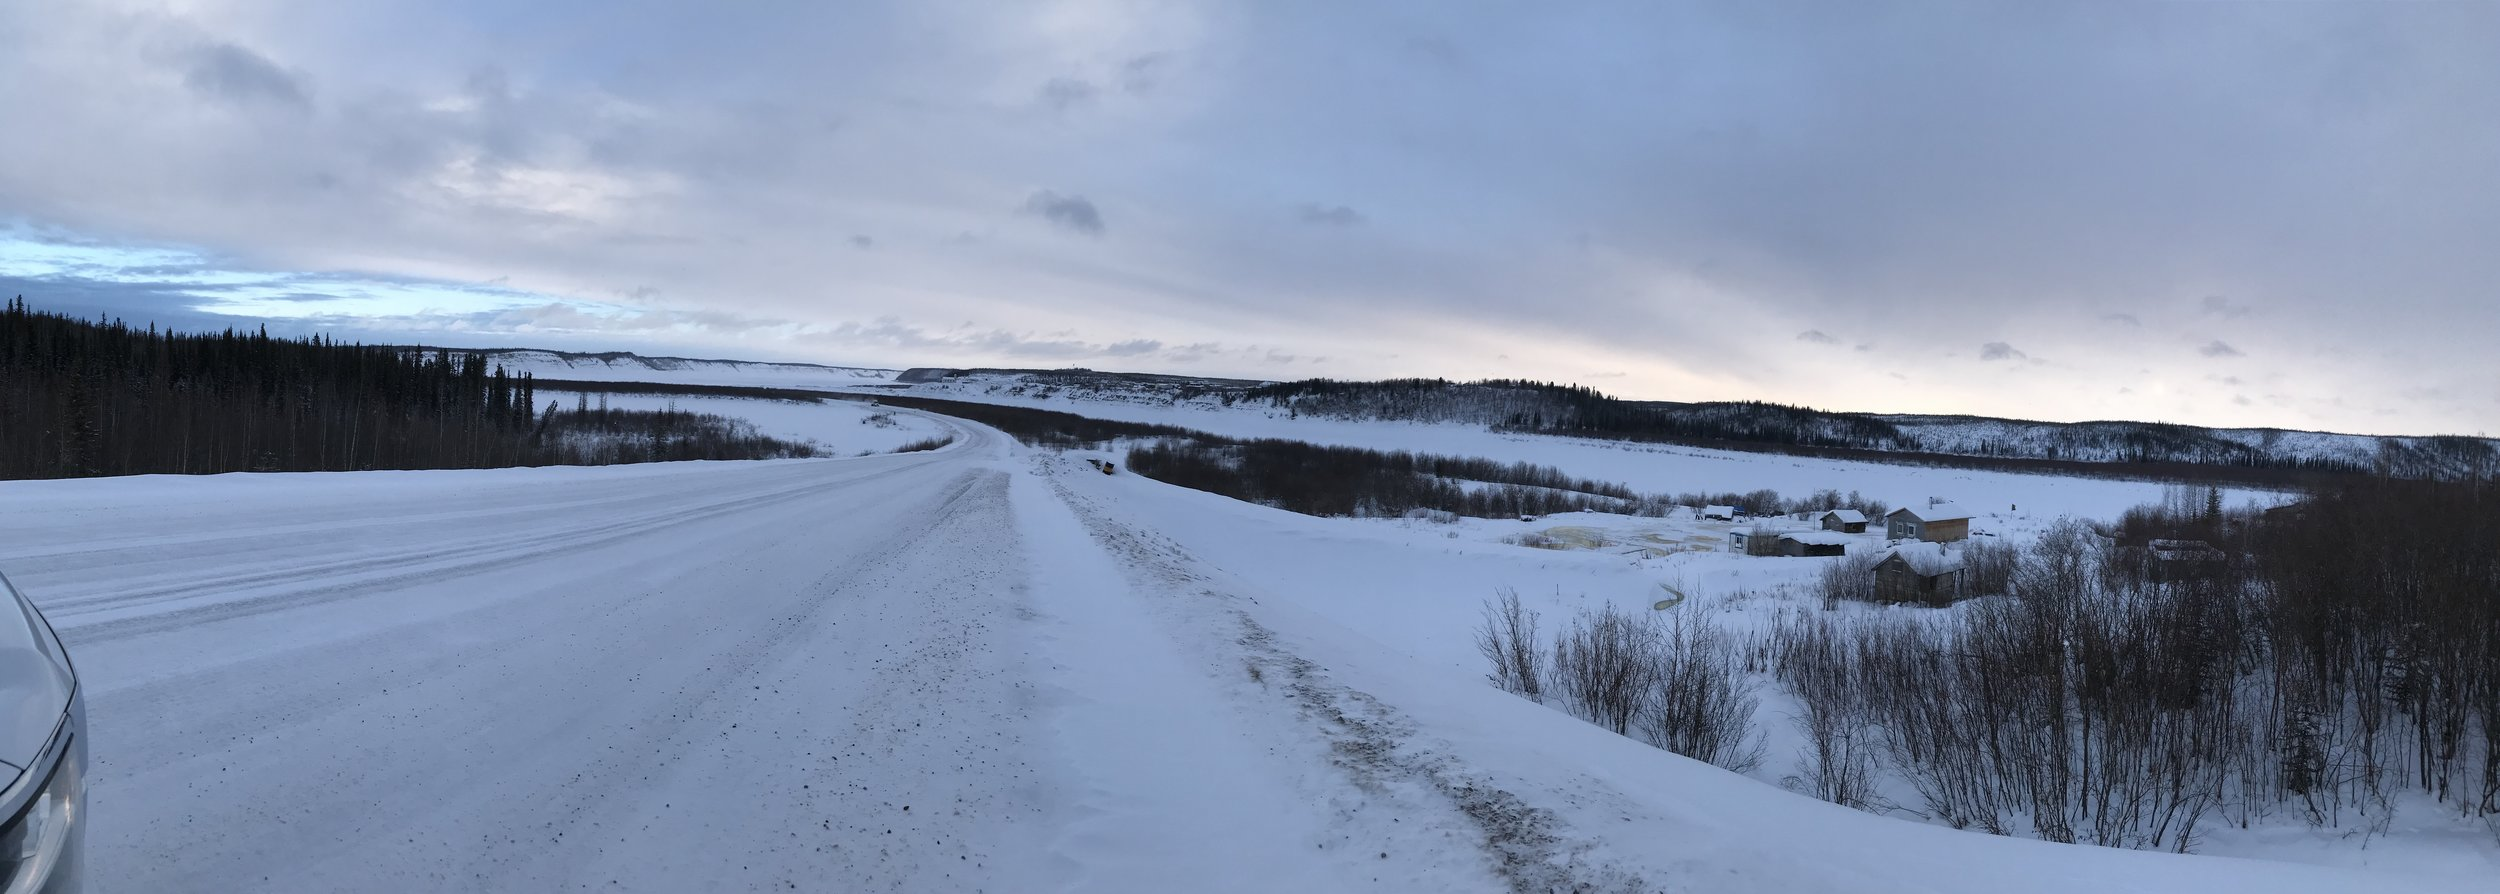 Approaching Ice bridge and Mackenzie River